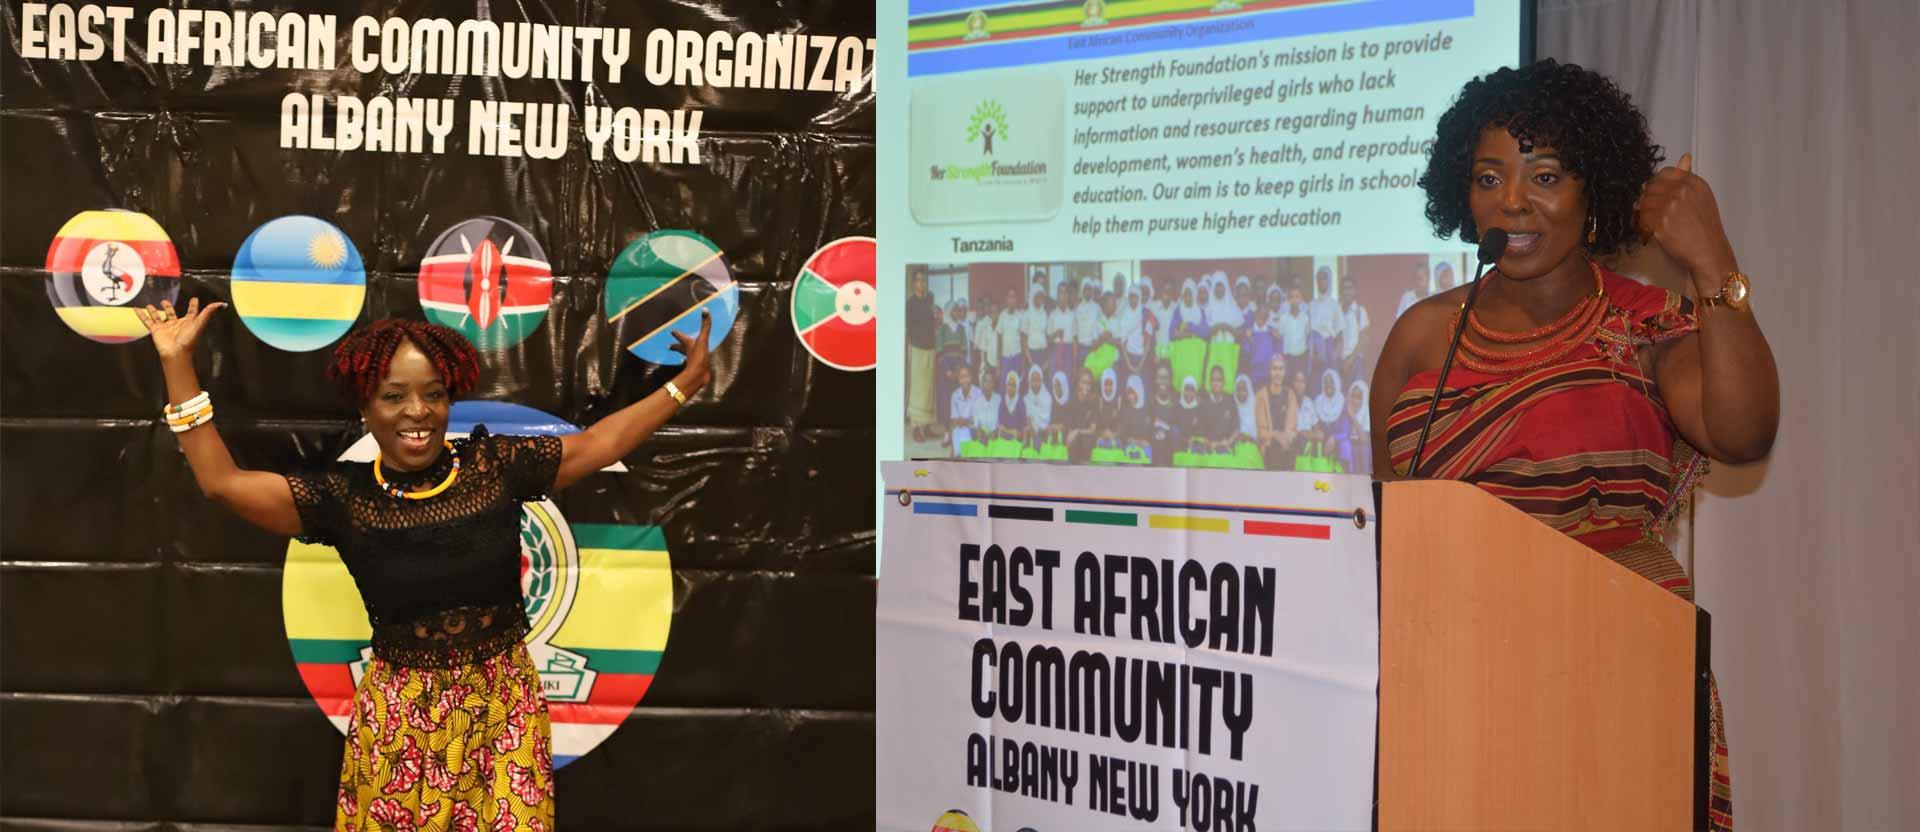 east african community organisation